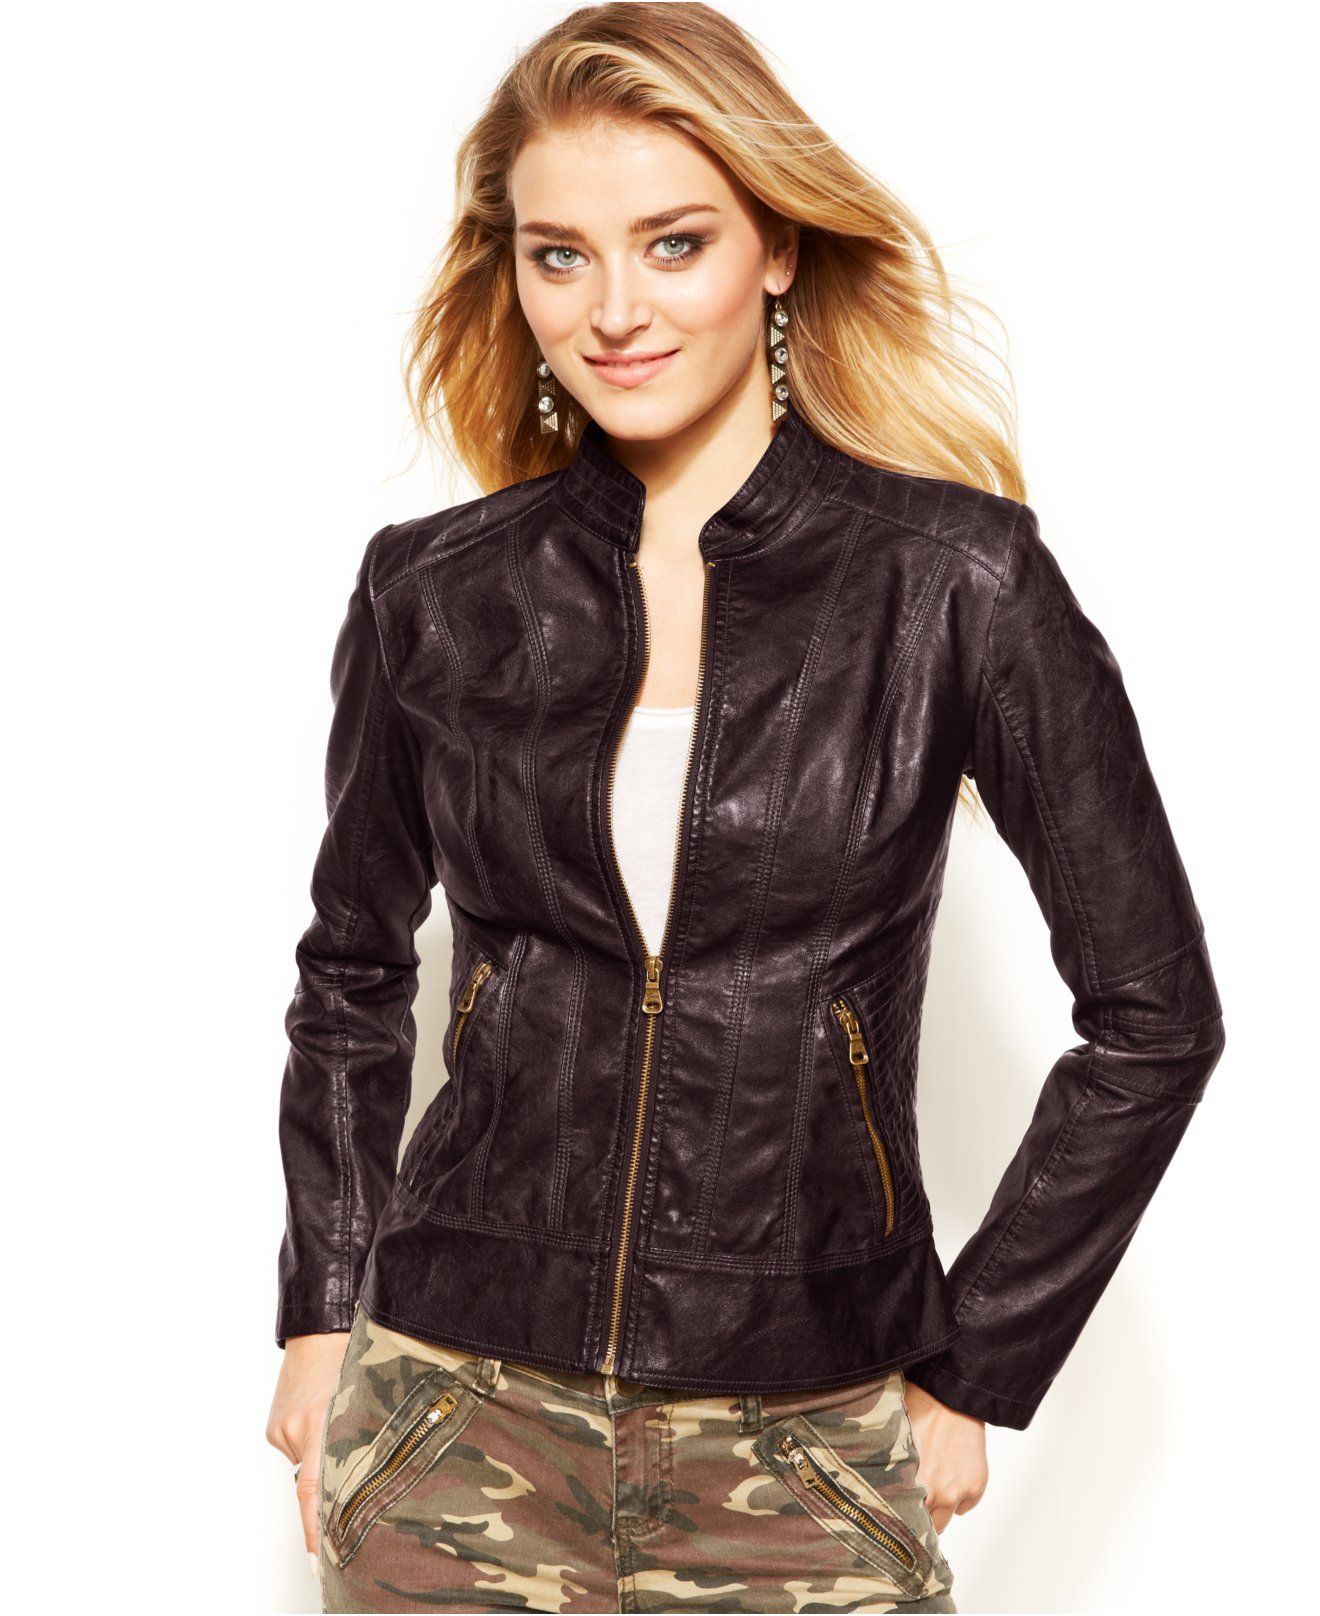 Guess Faux Leather Jacket Coats Women Macy S Blazer Jackets For Women Leather Jacket Fashion [ 1616 x 1320 Pixel ]